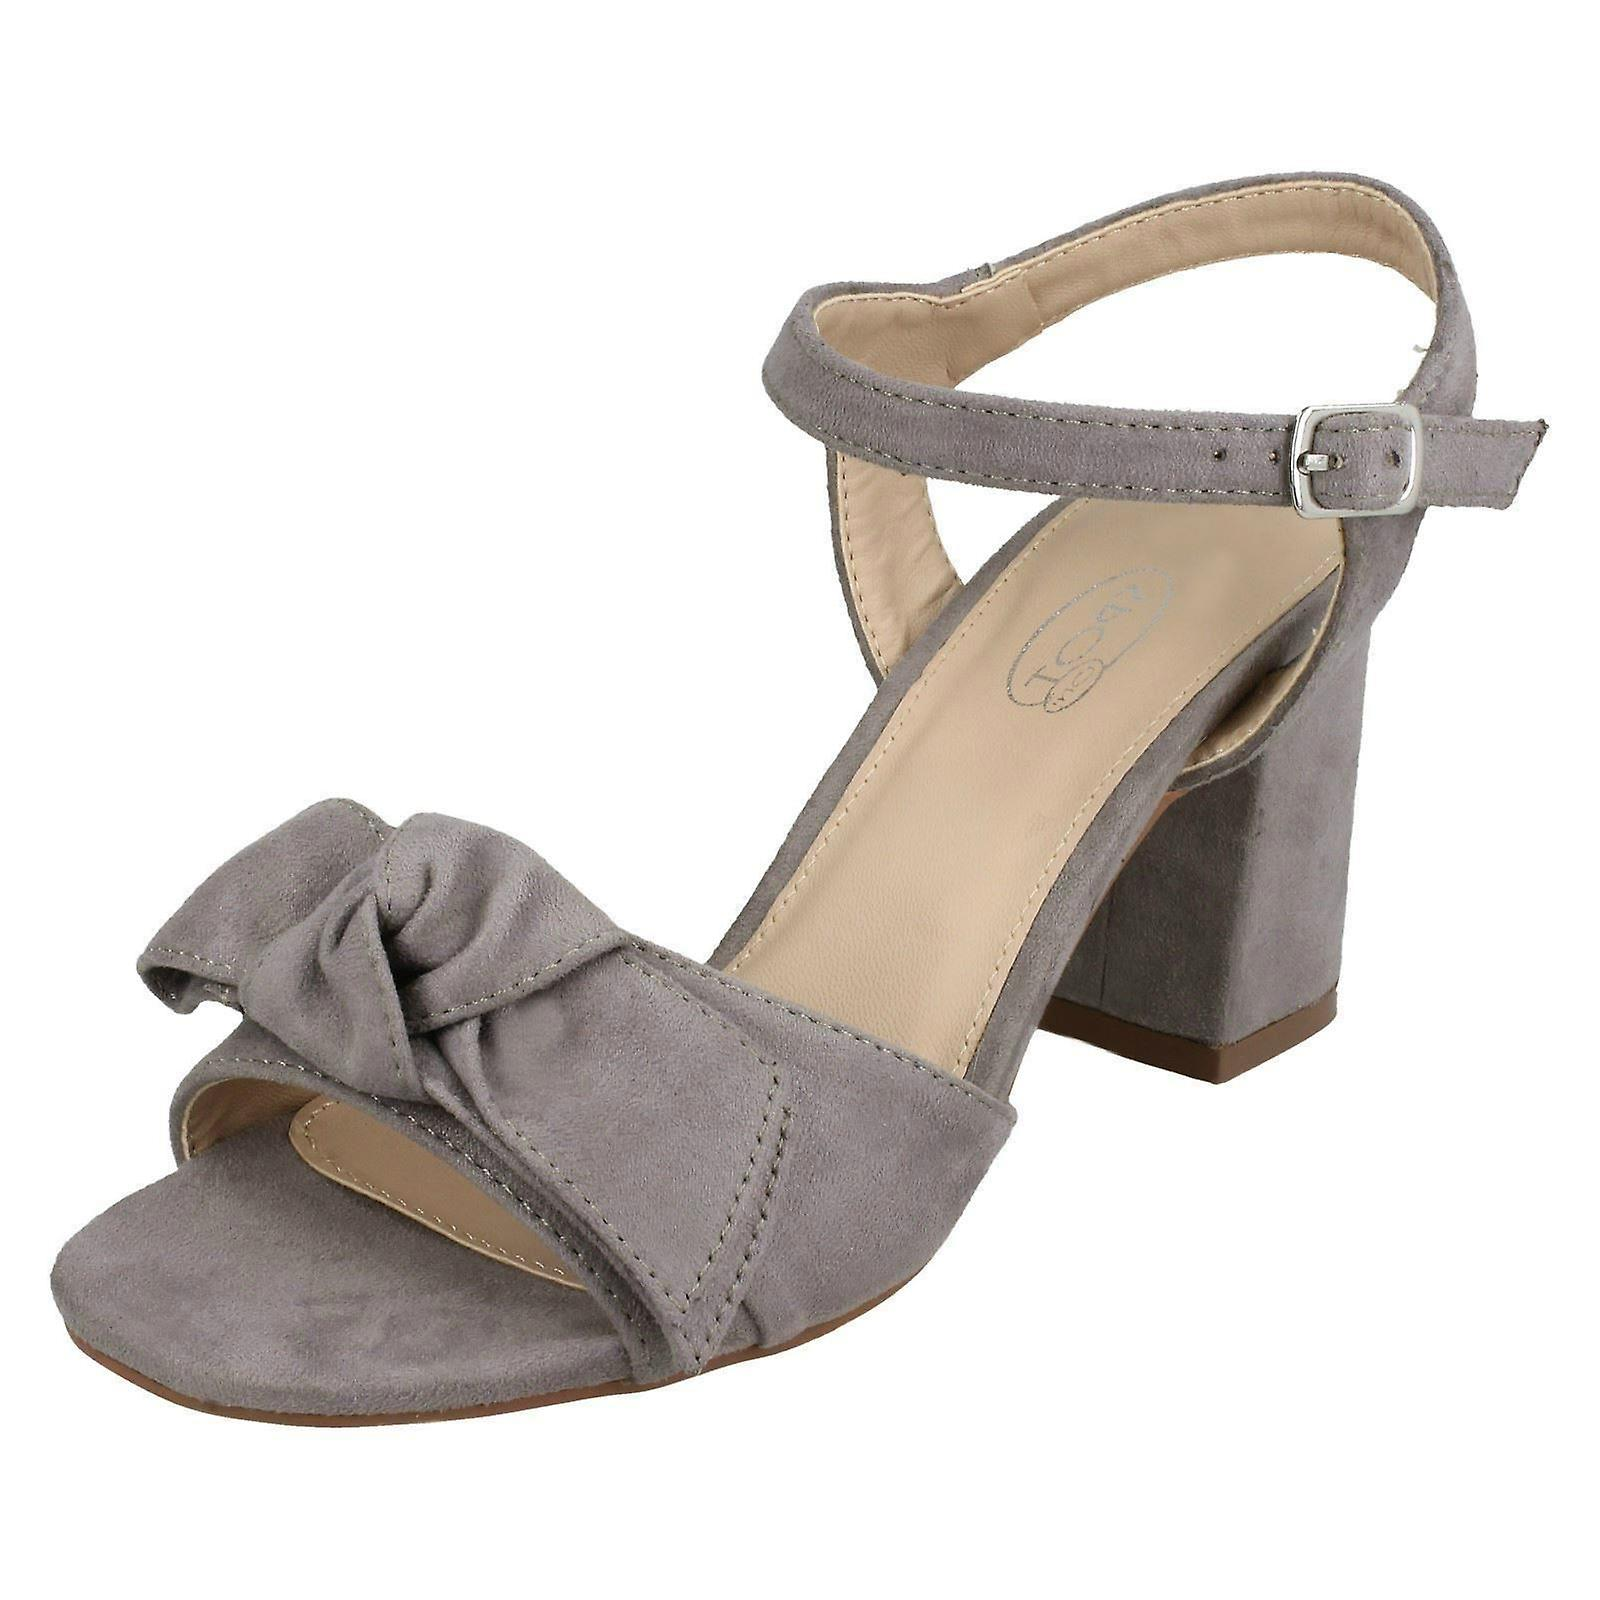 F10840 Size Blocked 41 EU Size UK Size Grey Heel On Sandals 10 US 8 Spot Microfibre Ladies xZCwOqXZ